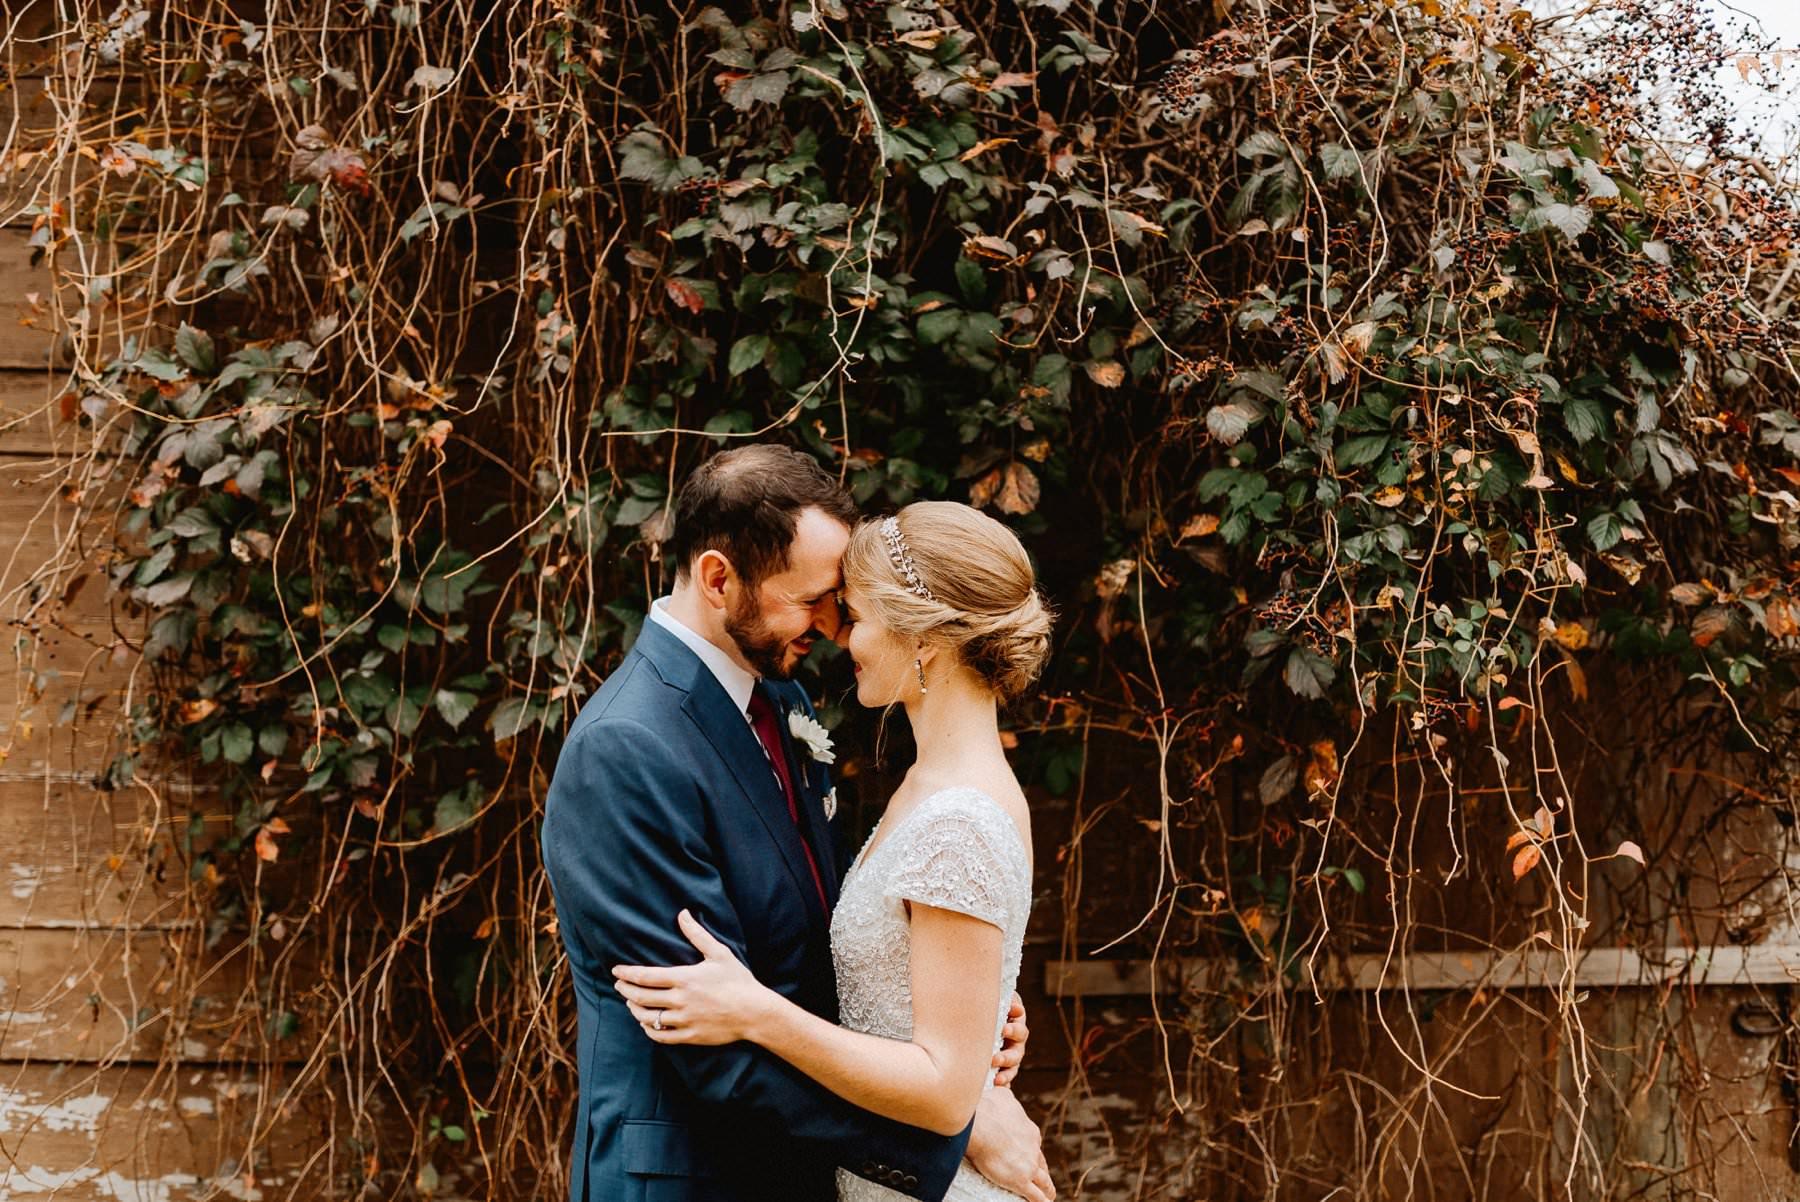 John_James_Audubon_Center_wedding-13.jpg